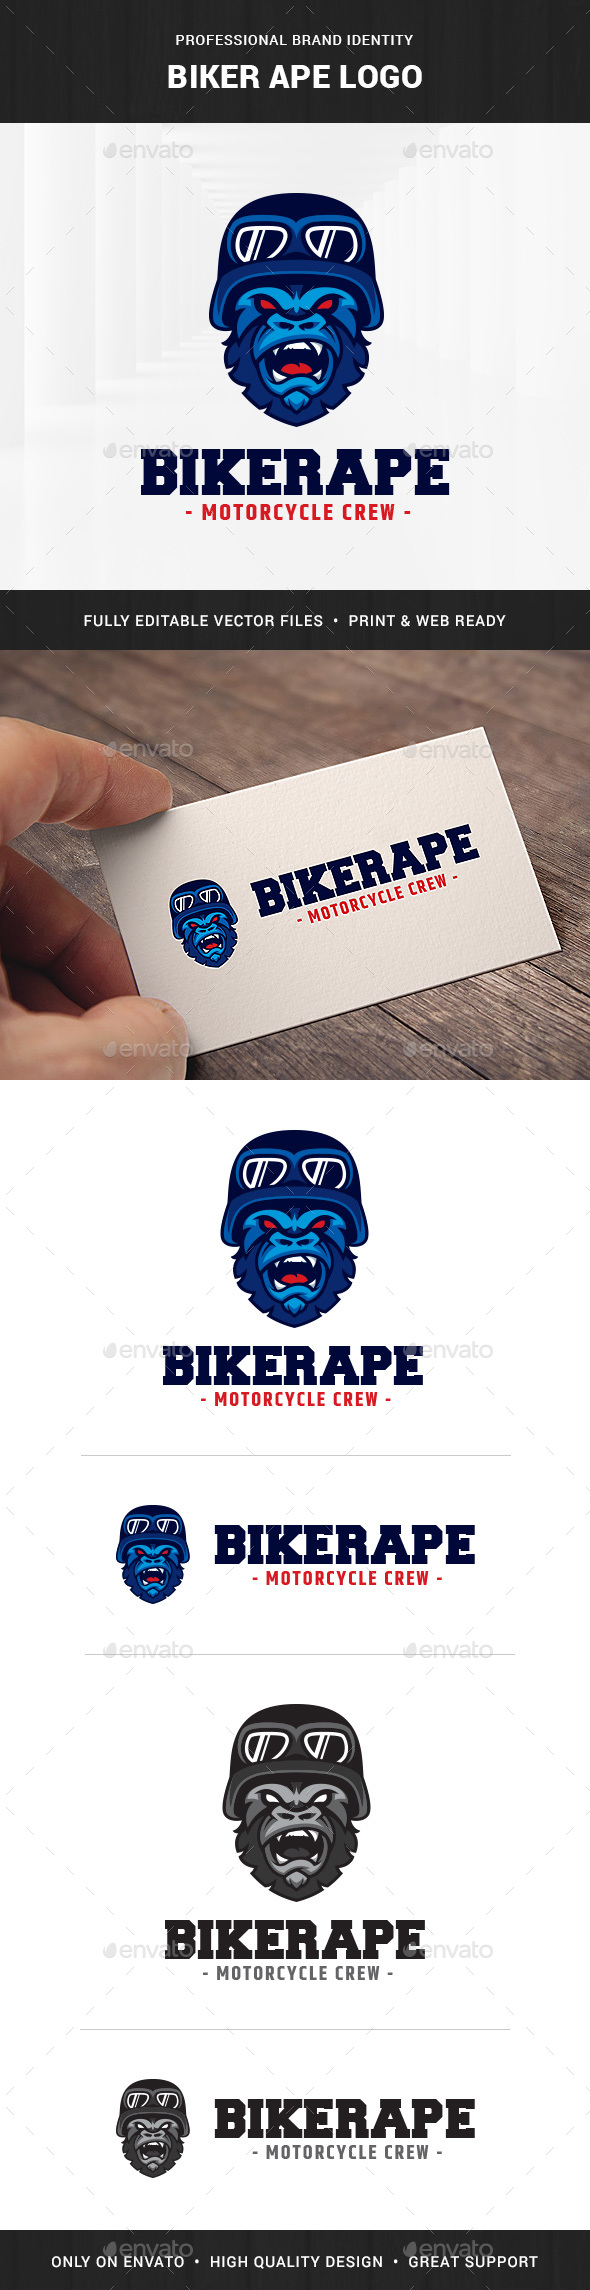 Biker Ape Logo Template - Animals Logo Templates